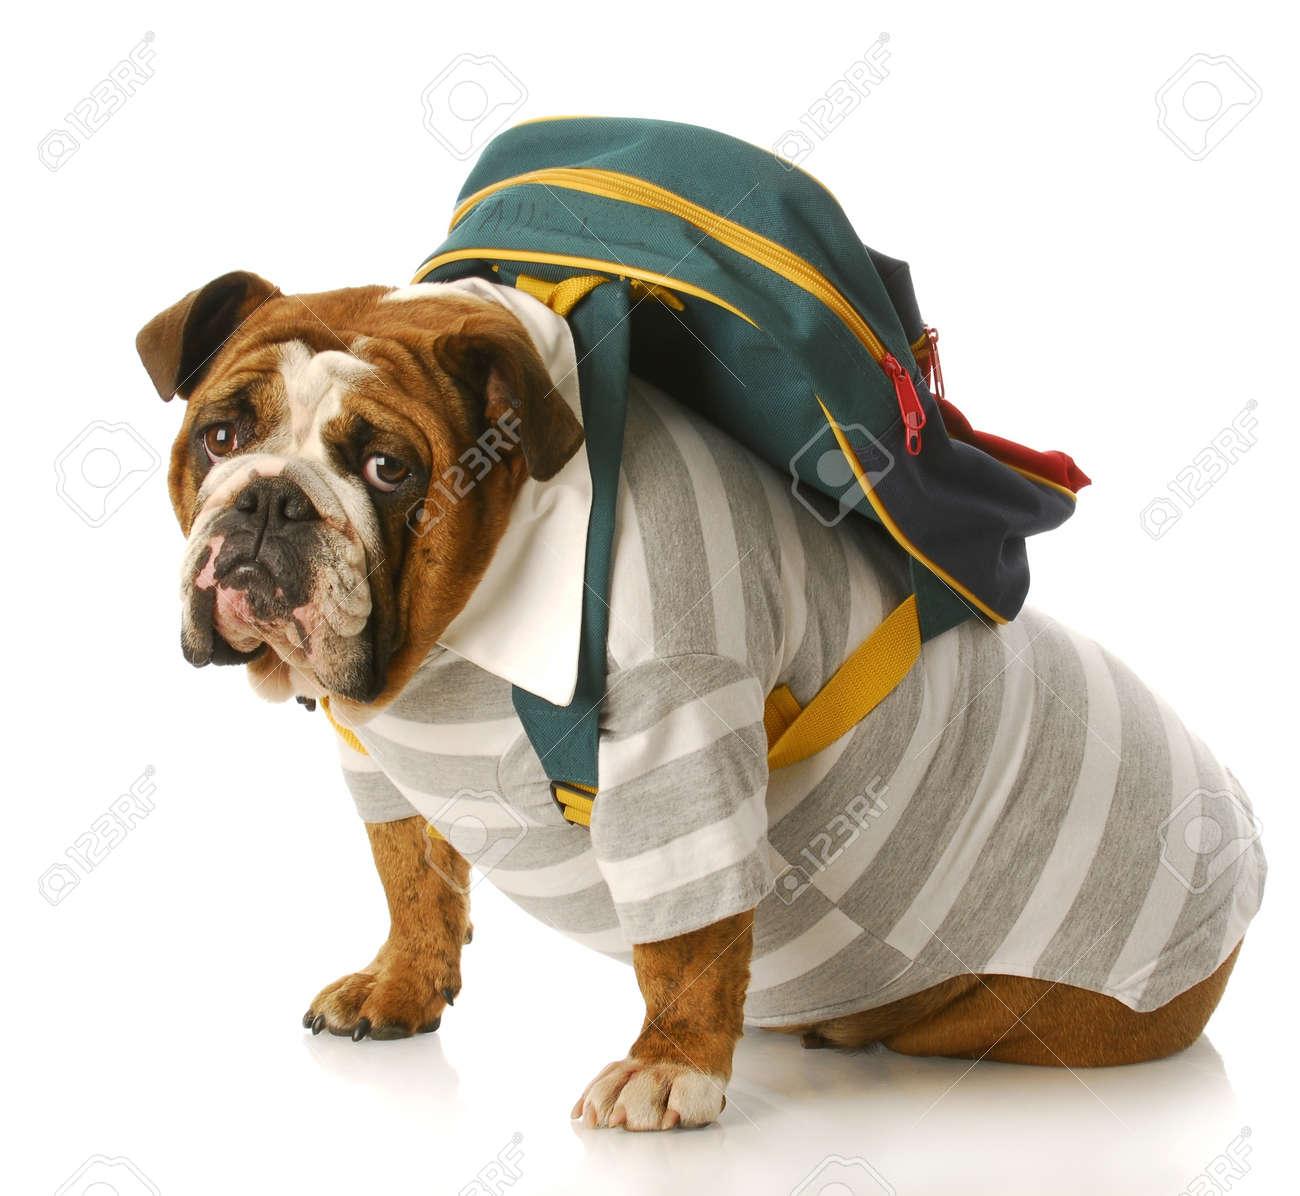 english bulldog wearing striped shirt and back pack sitting with reflection on white background Stock Photo - 7378434